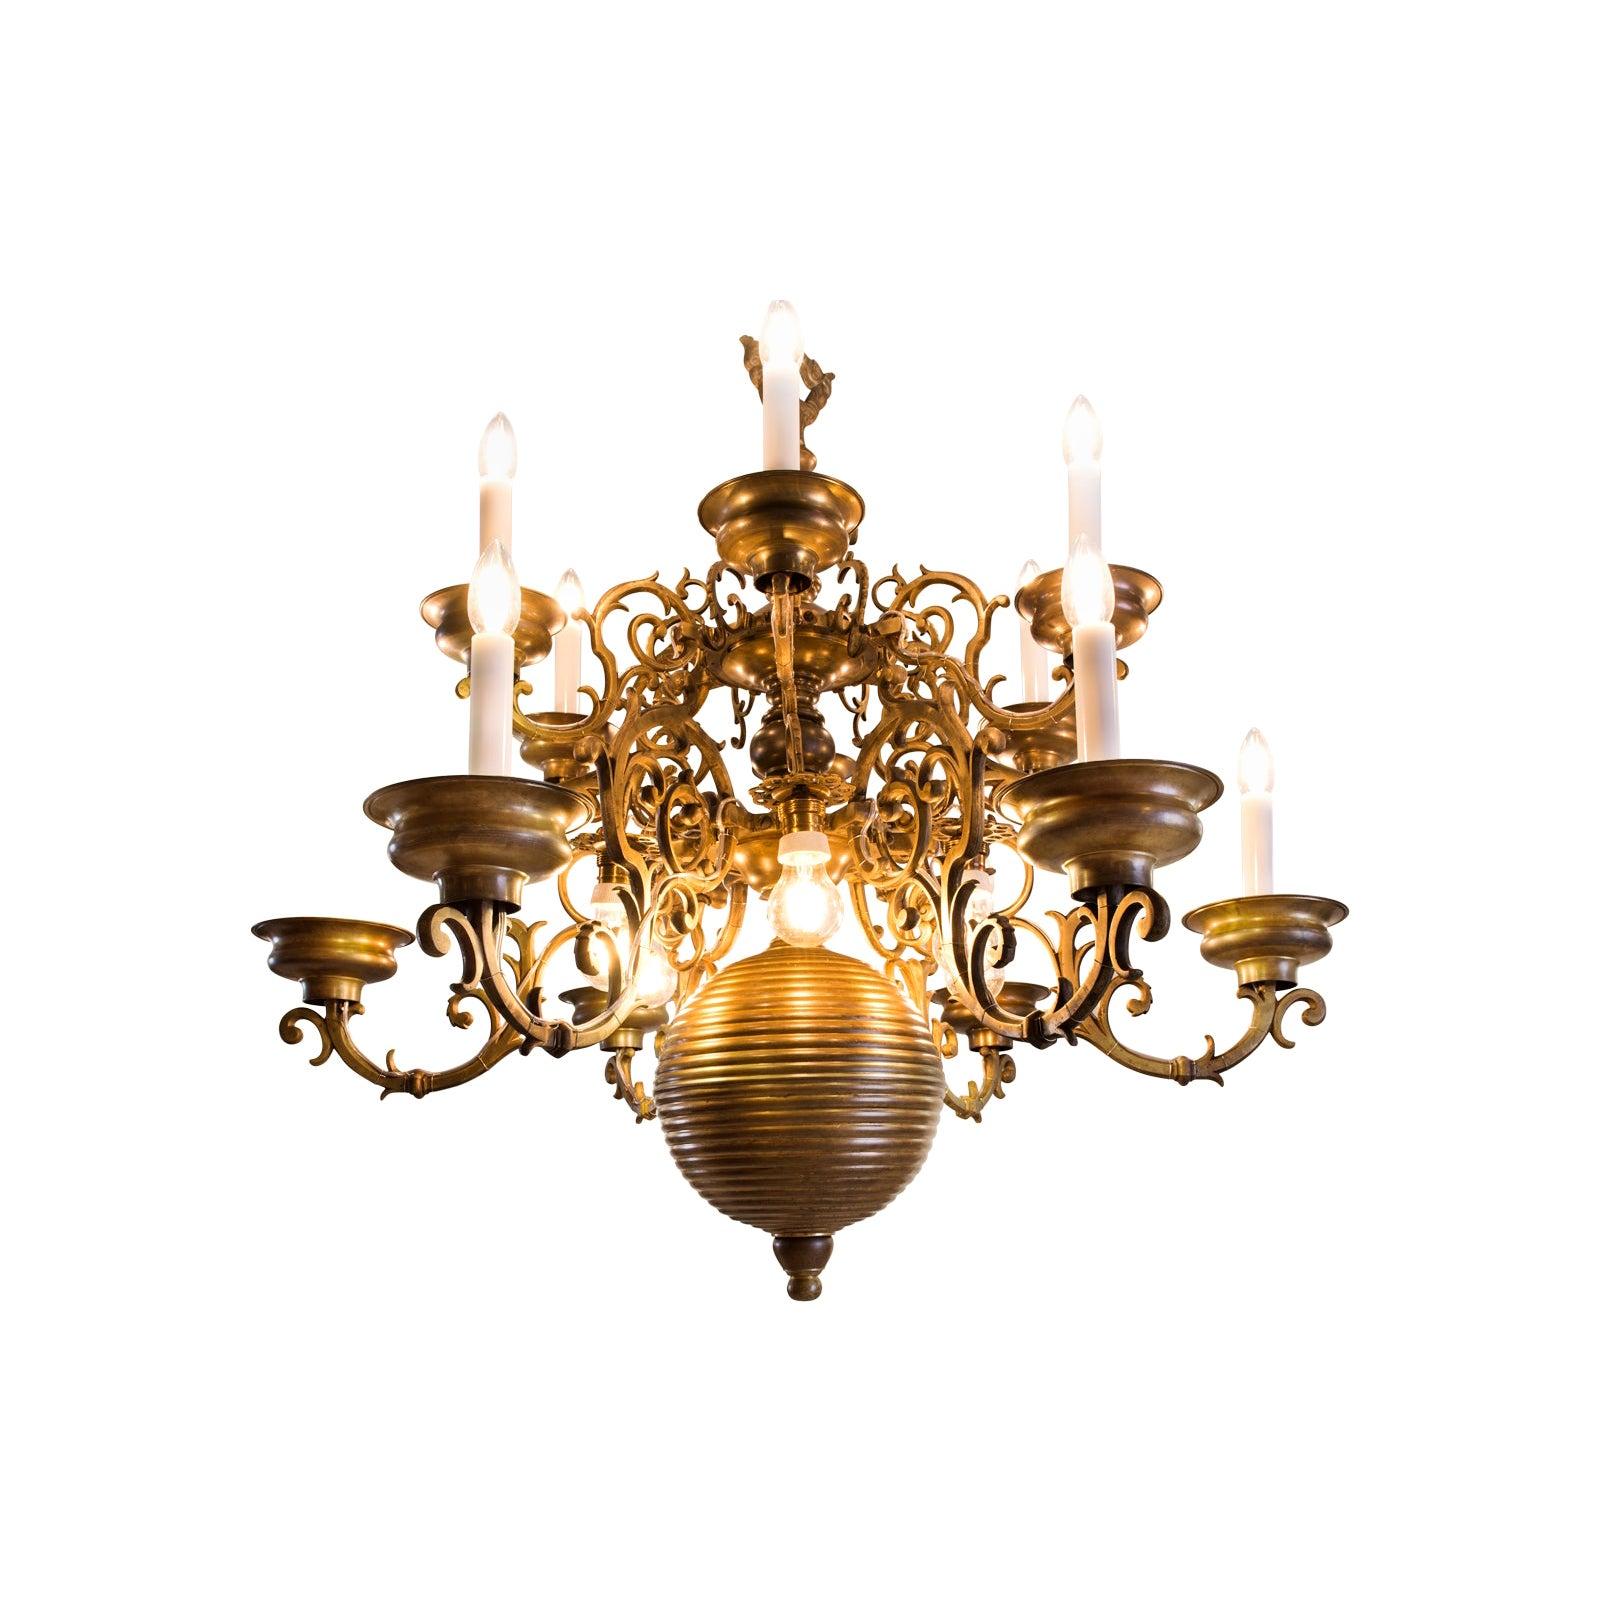 Original Austro -Hungary Flemish Baroque Chandelier 19th Century-1895-Restored